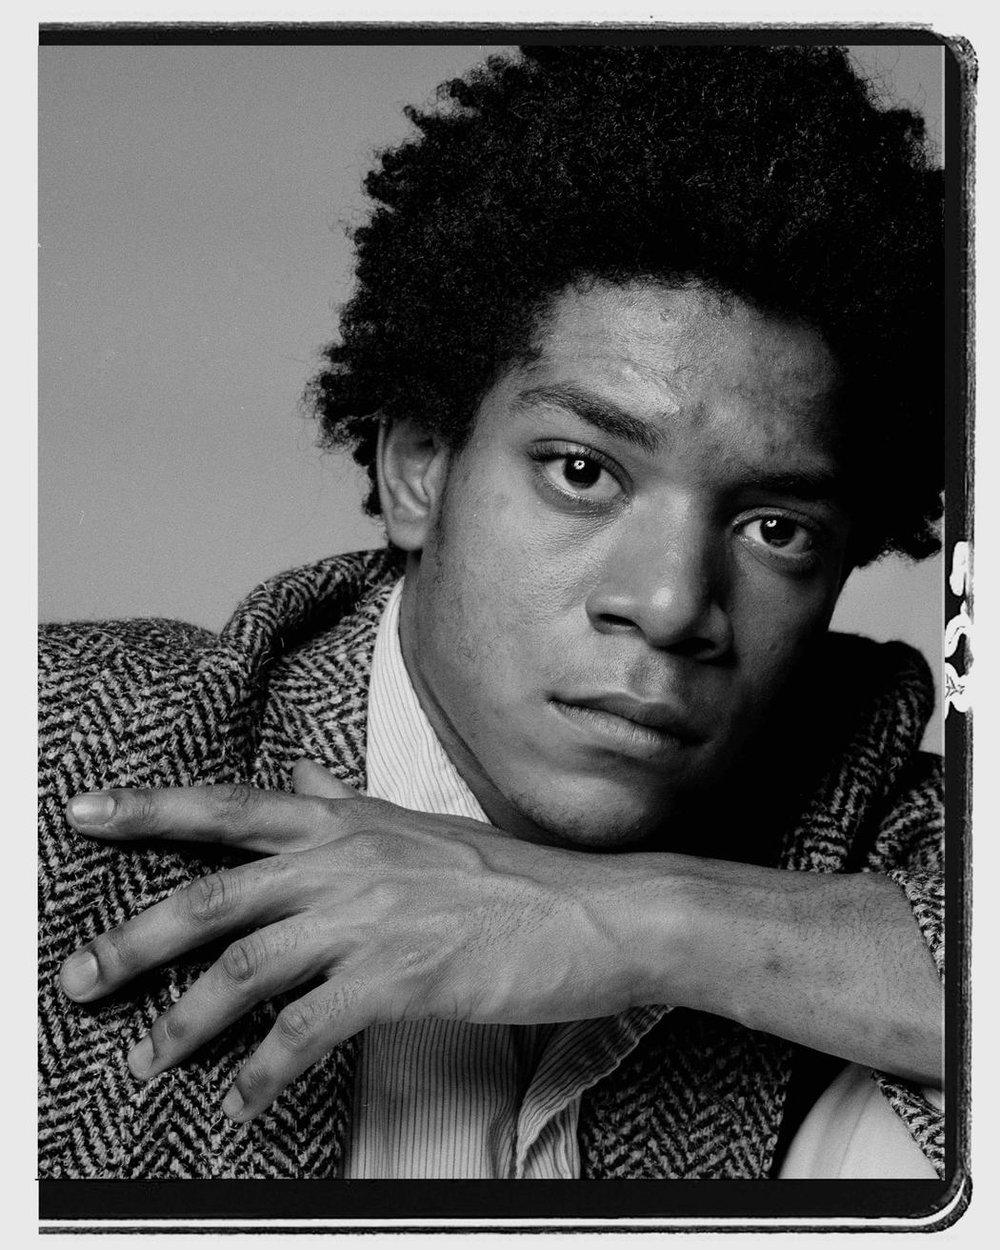 Richard-corman-basquiat-profile-photo-5.jpg